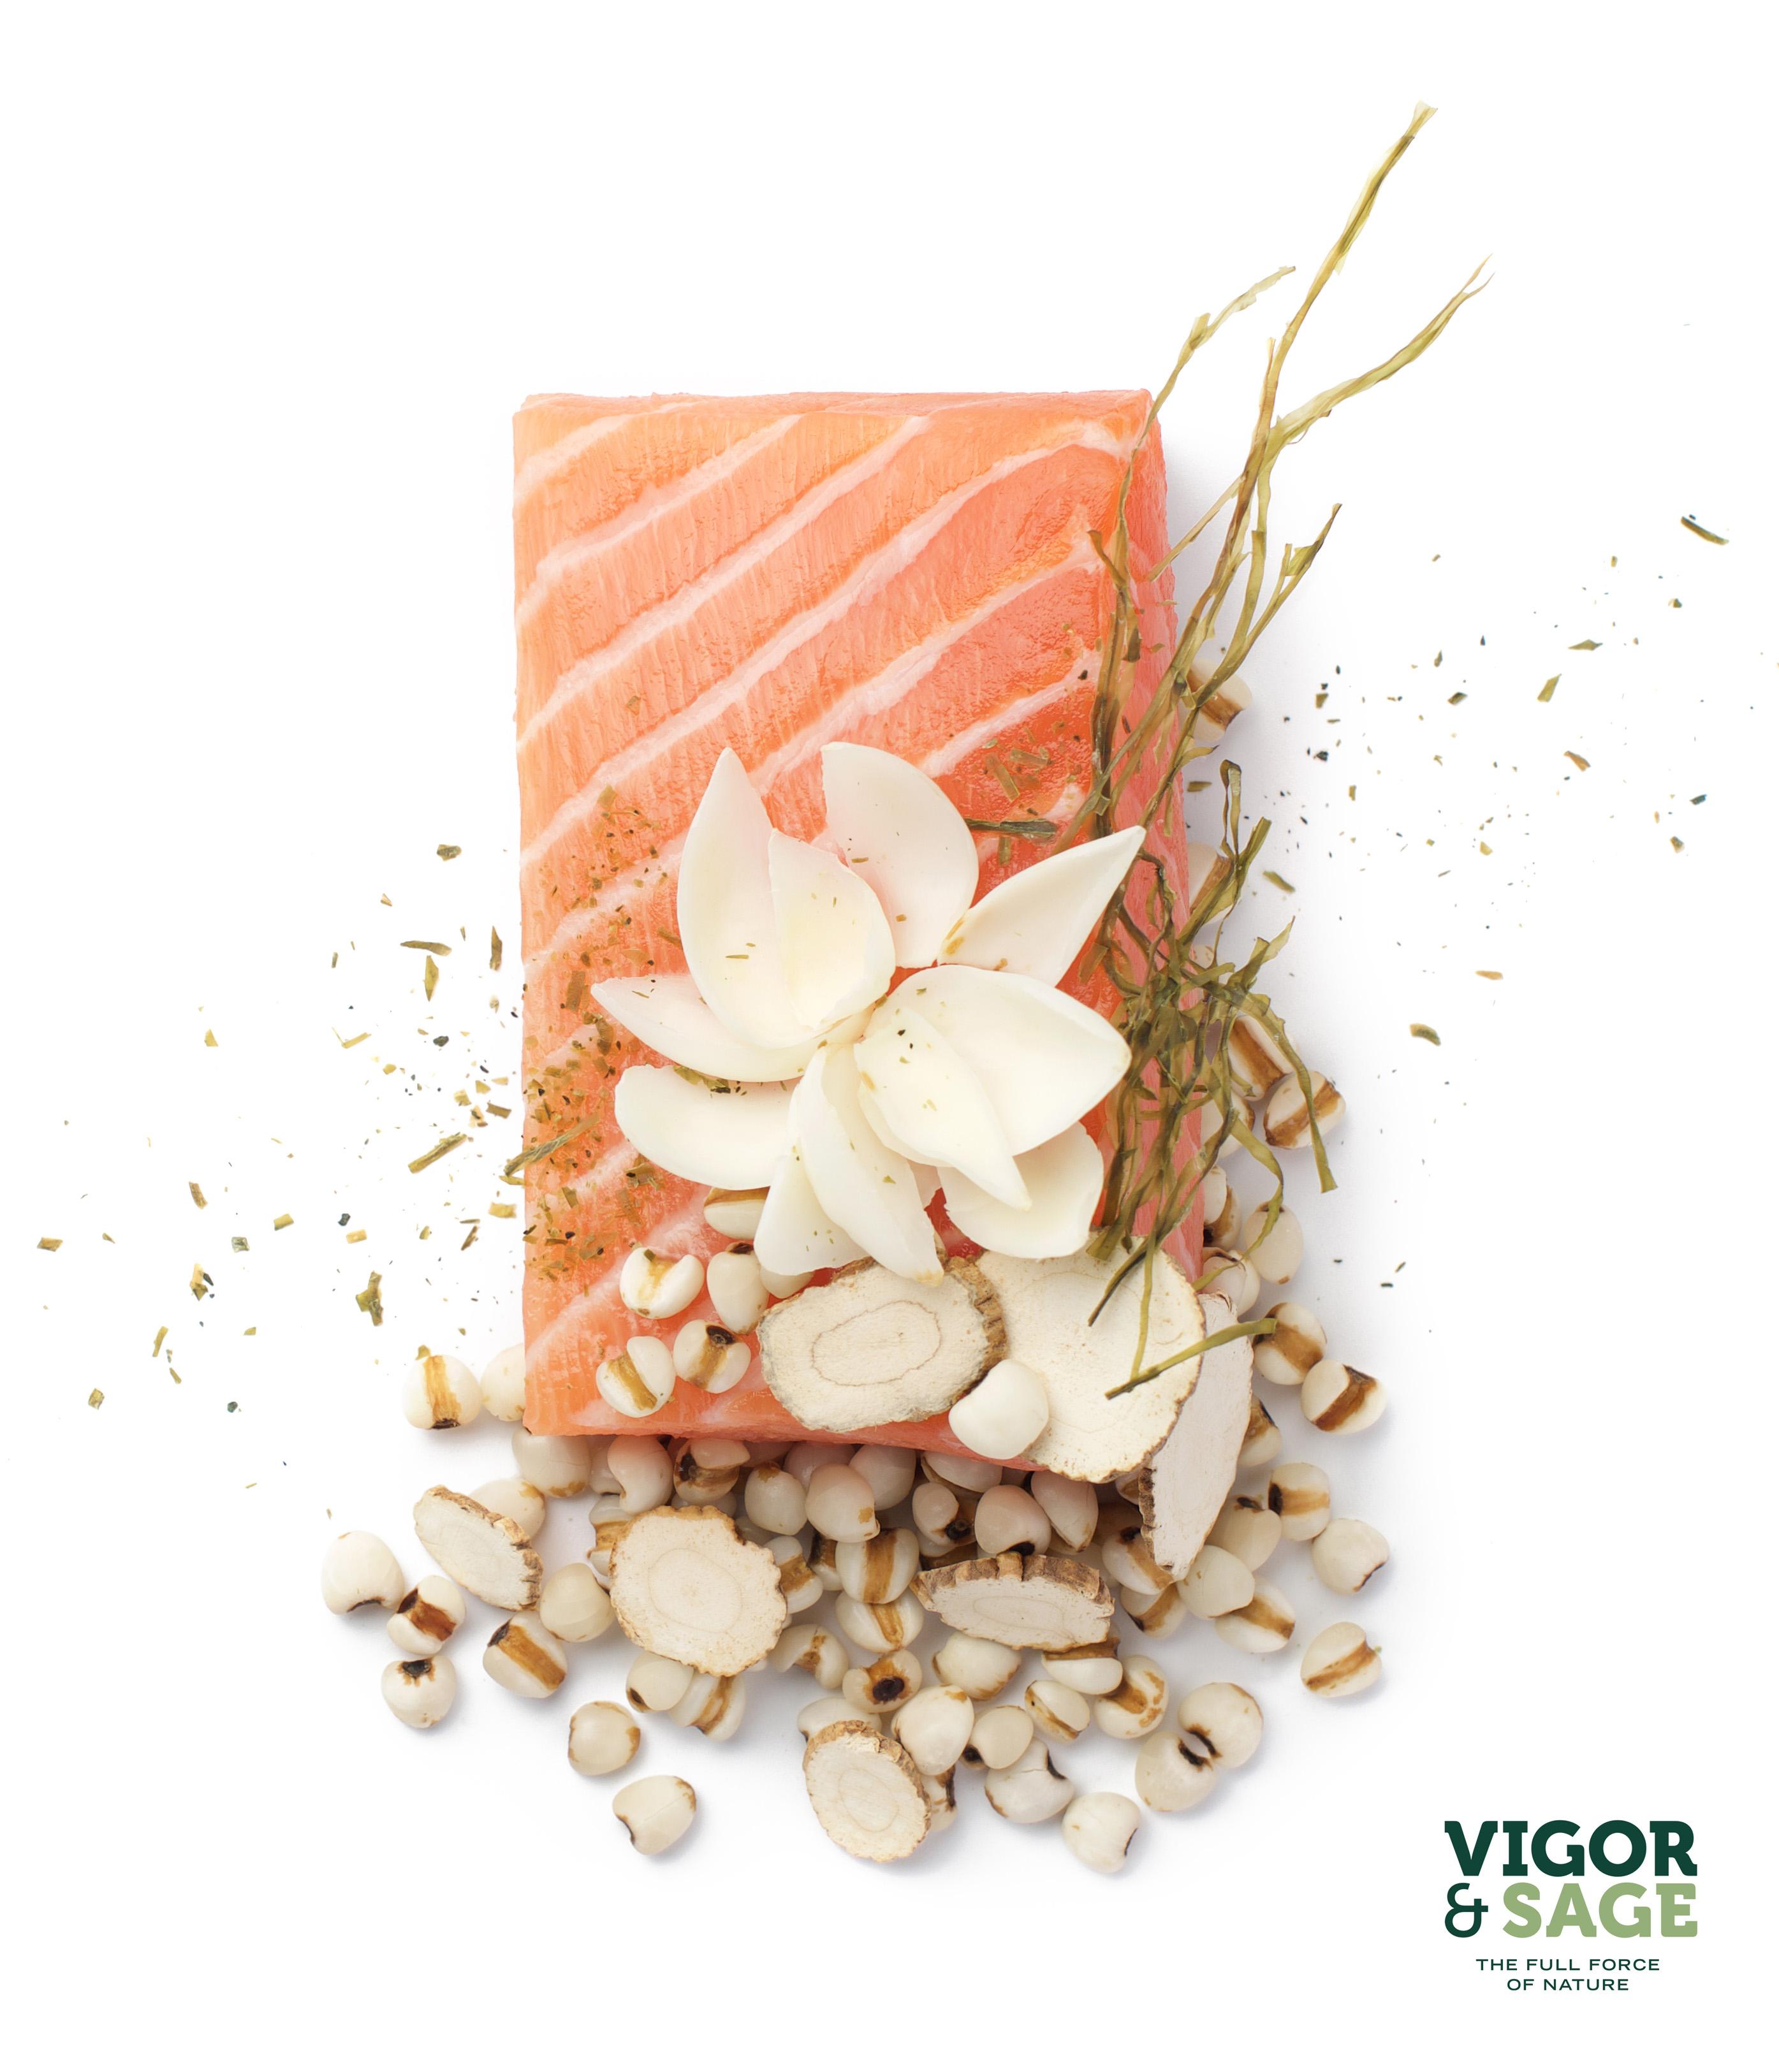 Vigor&Sage01